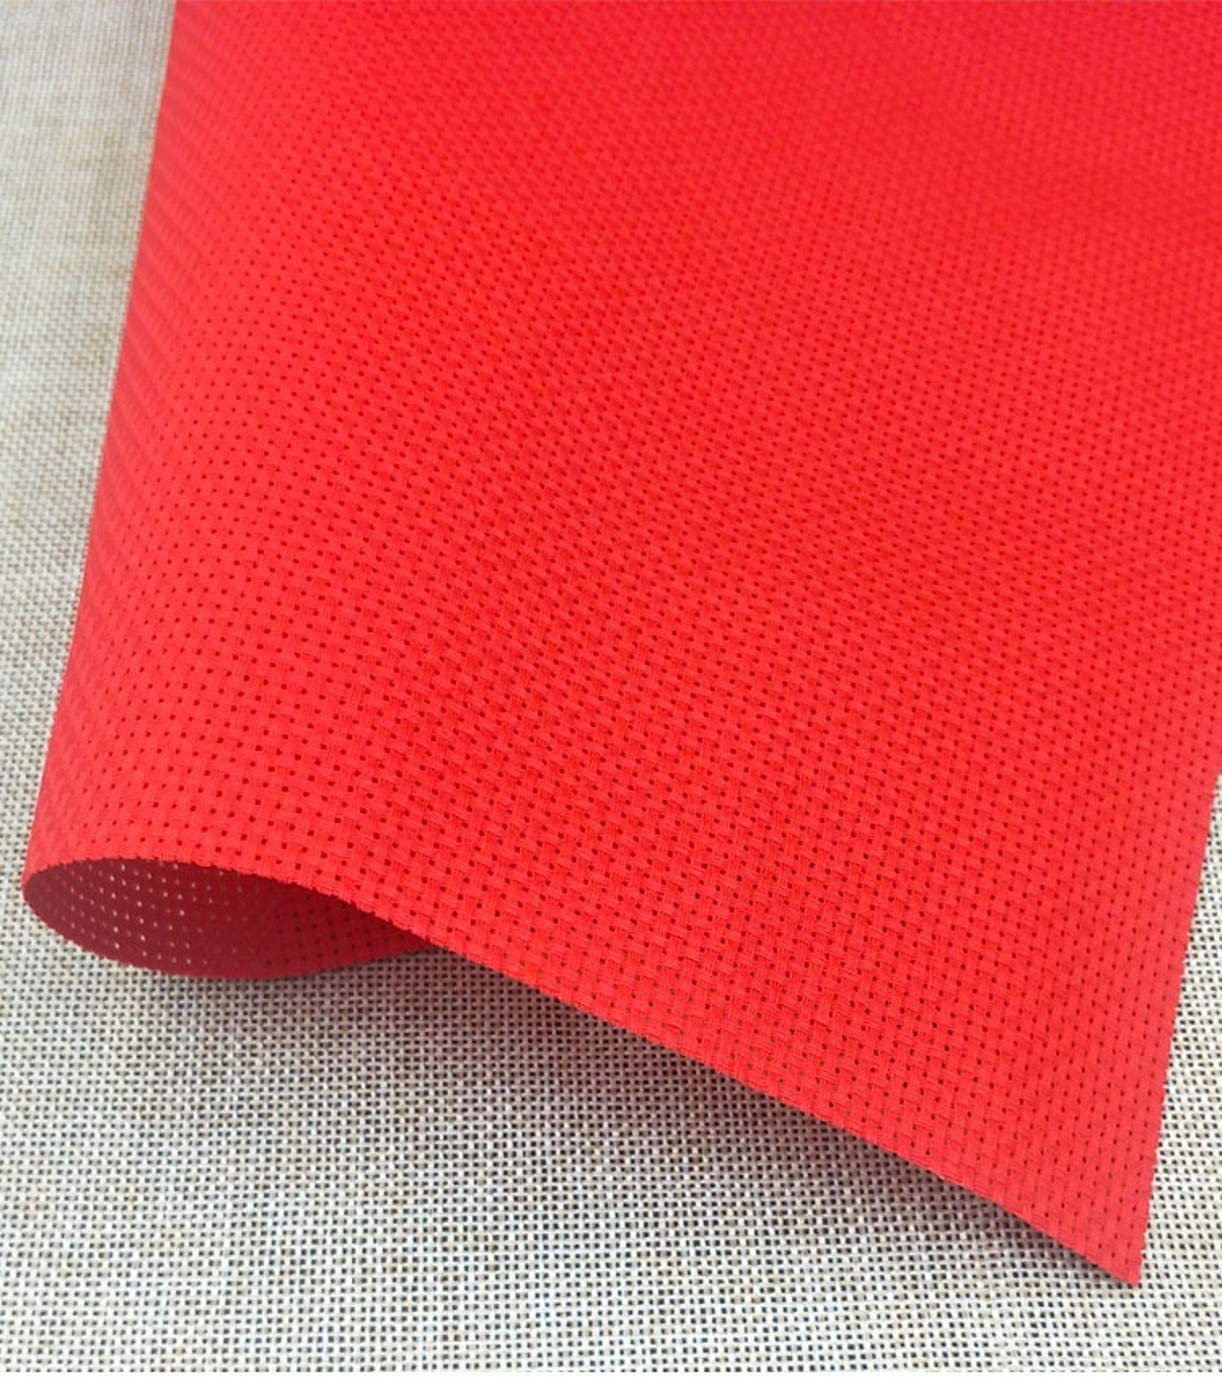 WellieSTR 150 x 90cm RED 100% Regular discount 11c Embroidery Aida Genuine Free Shipping Cloth Cotton